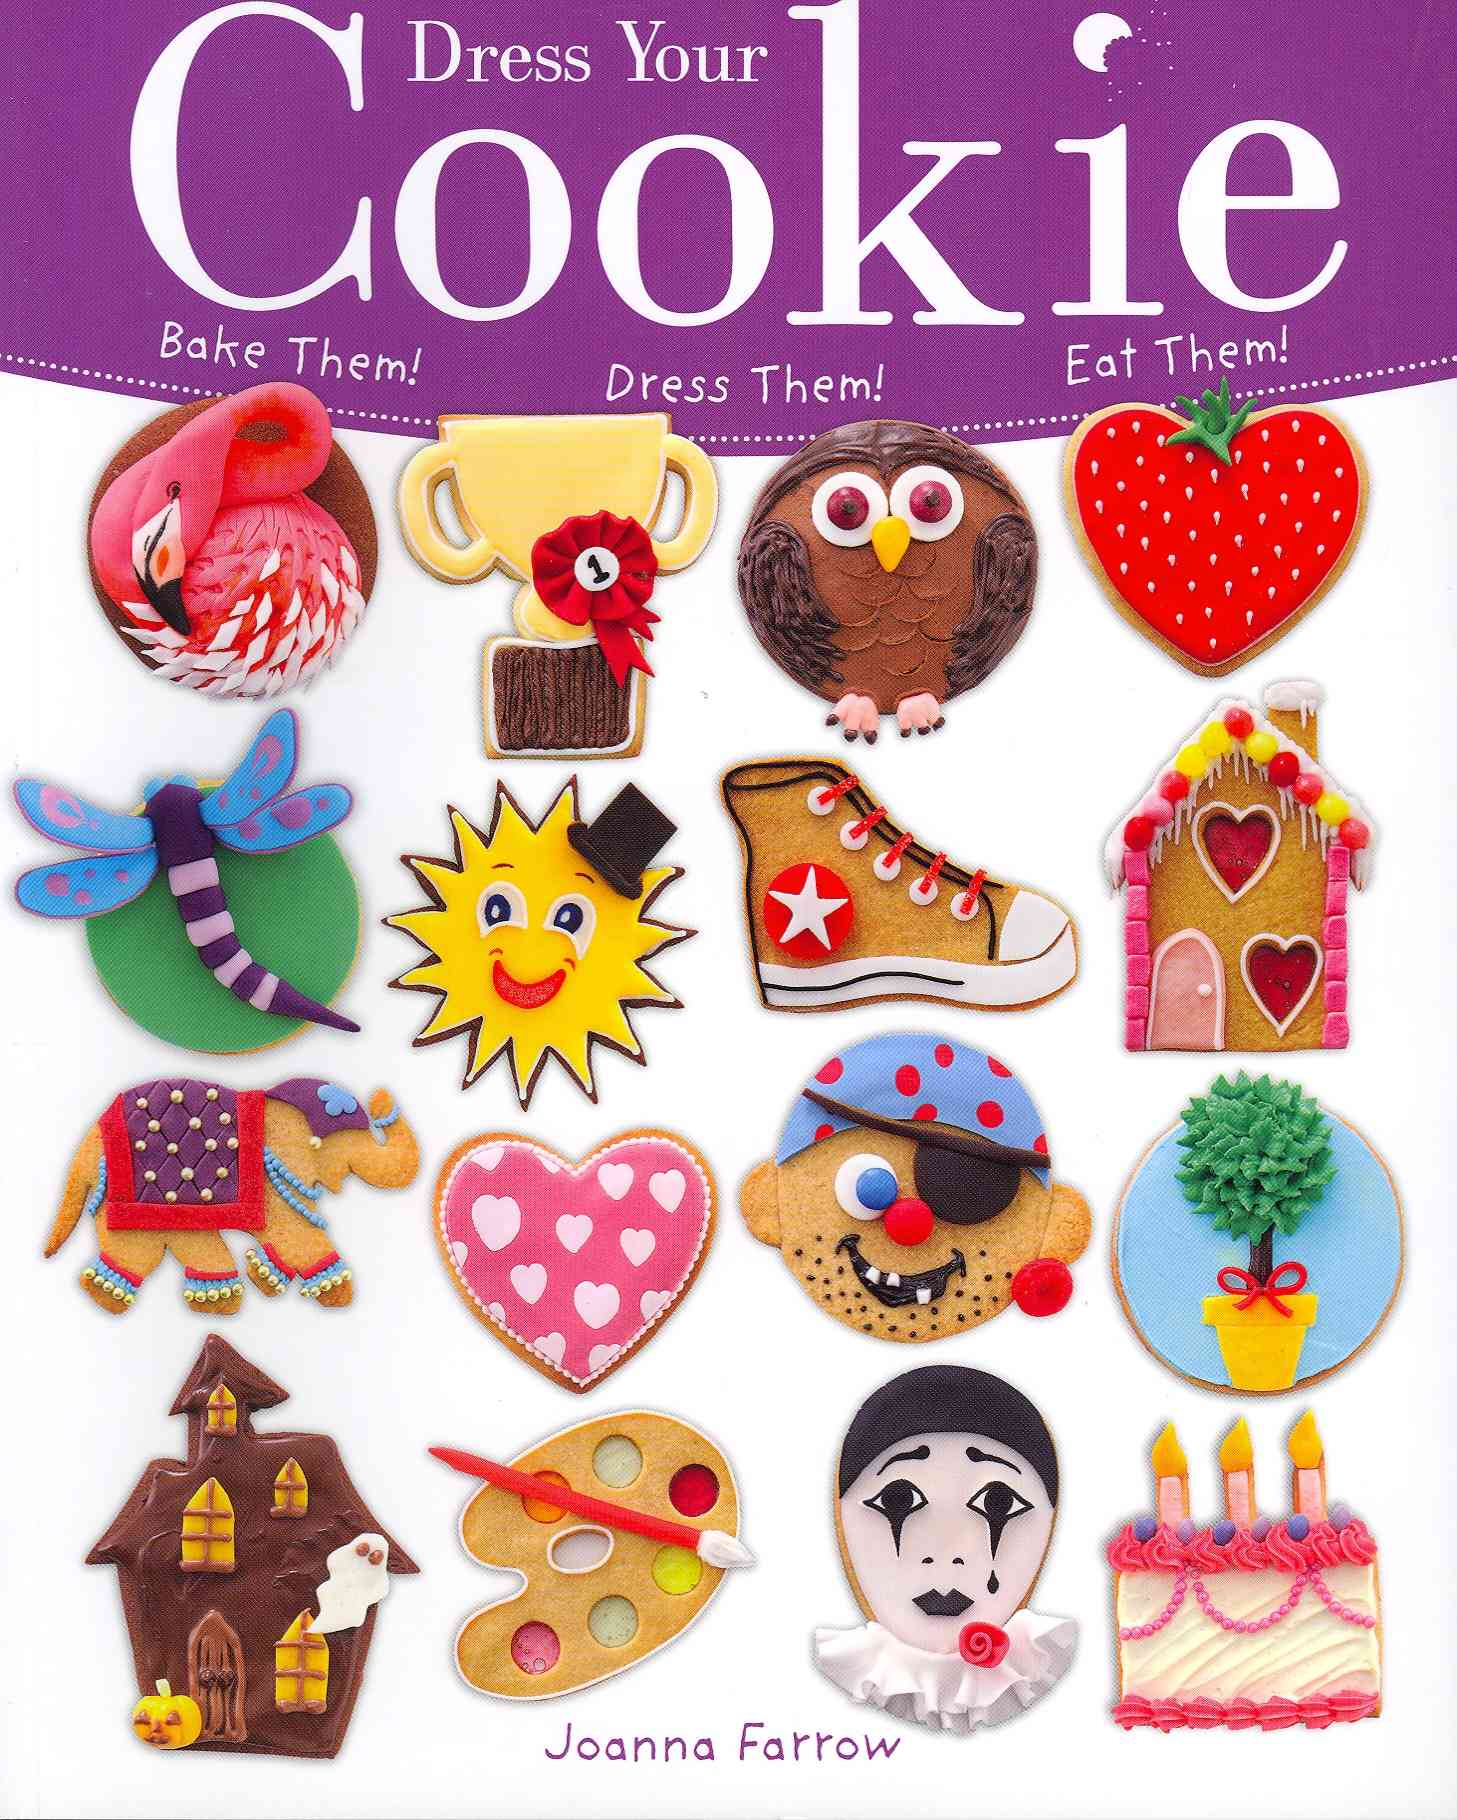 Dress Your Cookie: Bake Them! Dress Them! Eat Them! (Paperback)